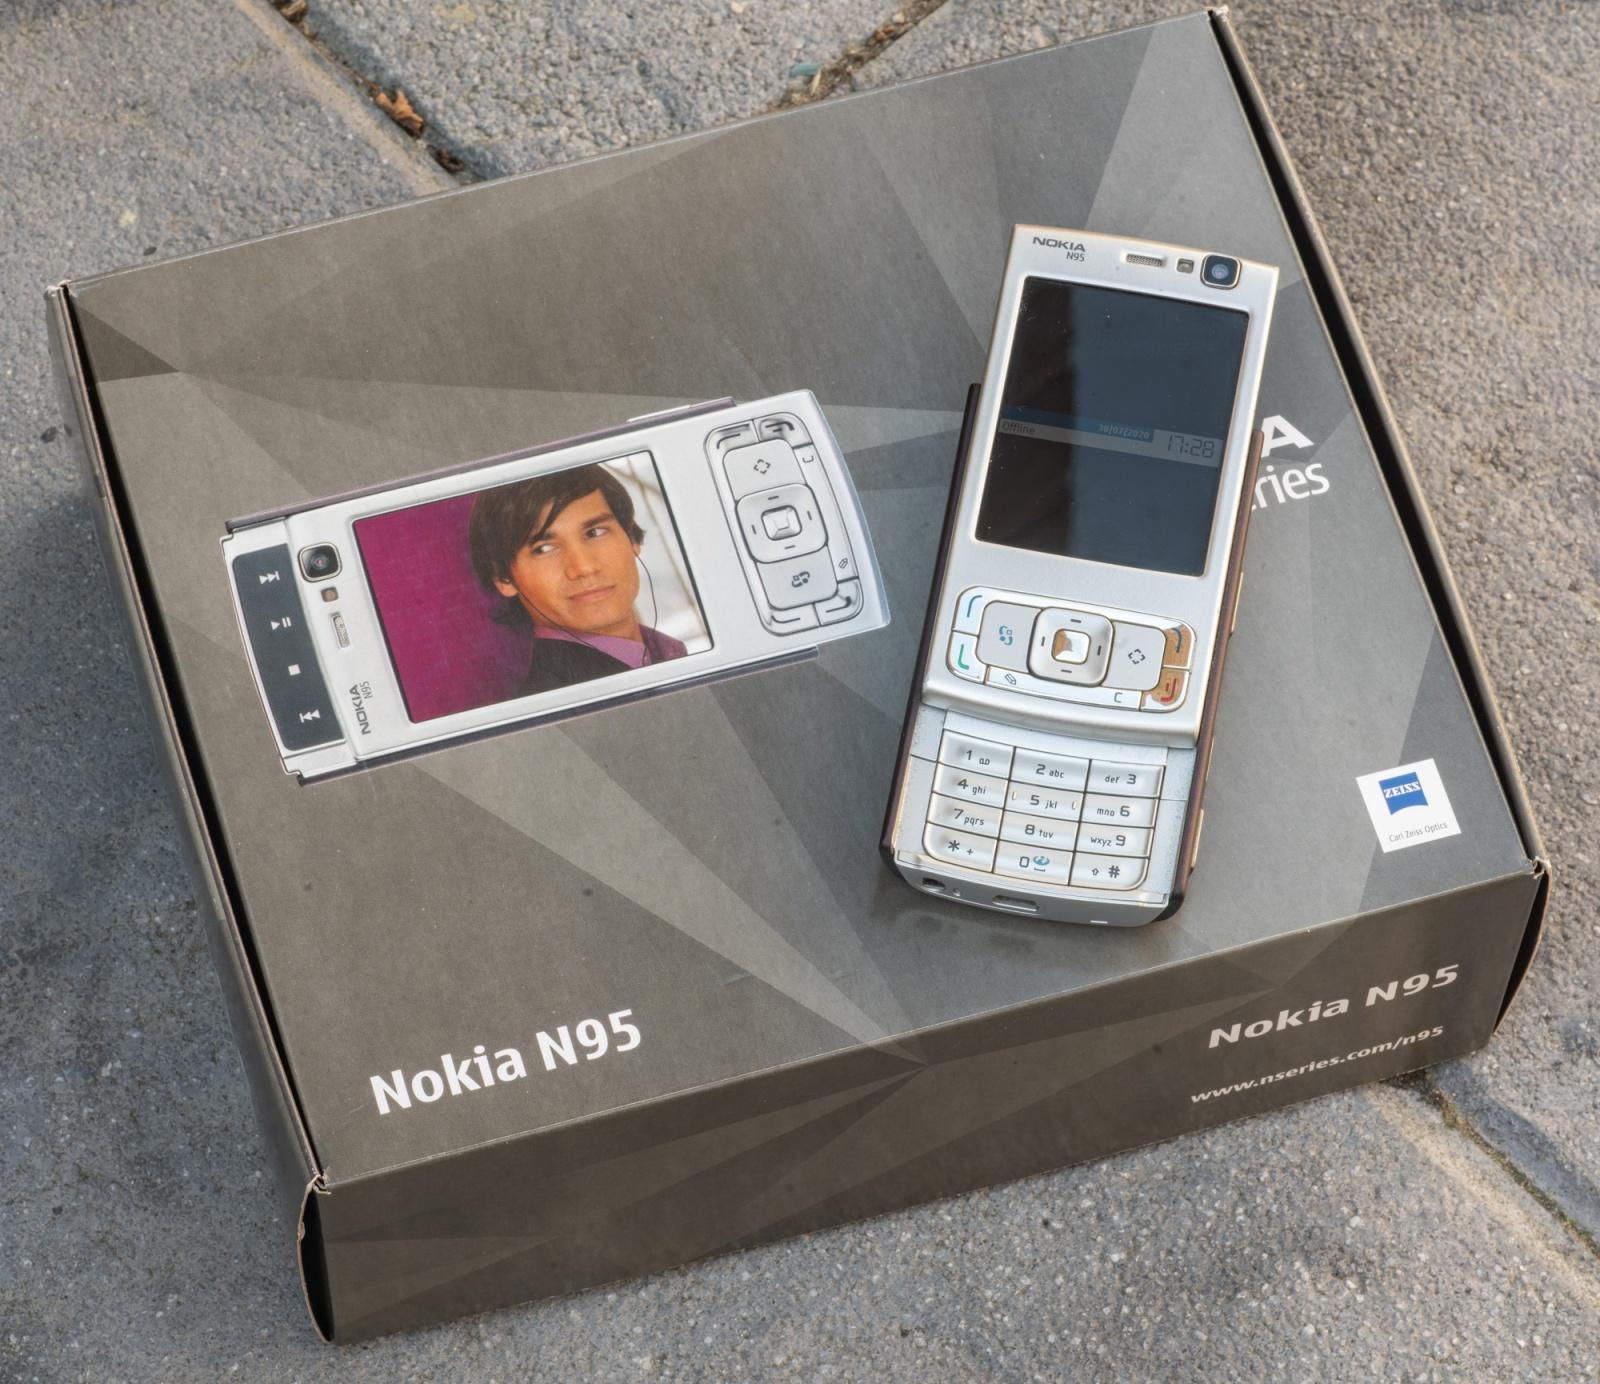 Nokia N95, лучший смартфон старой школы - 5